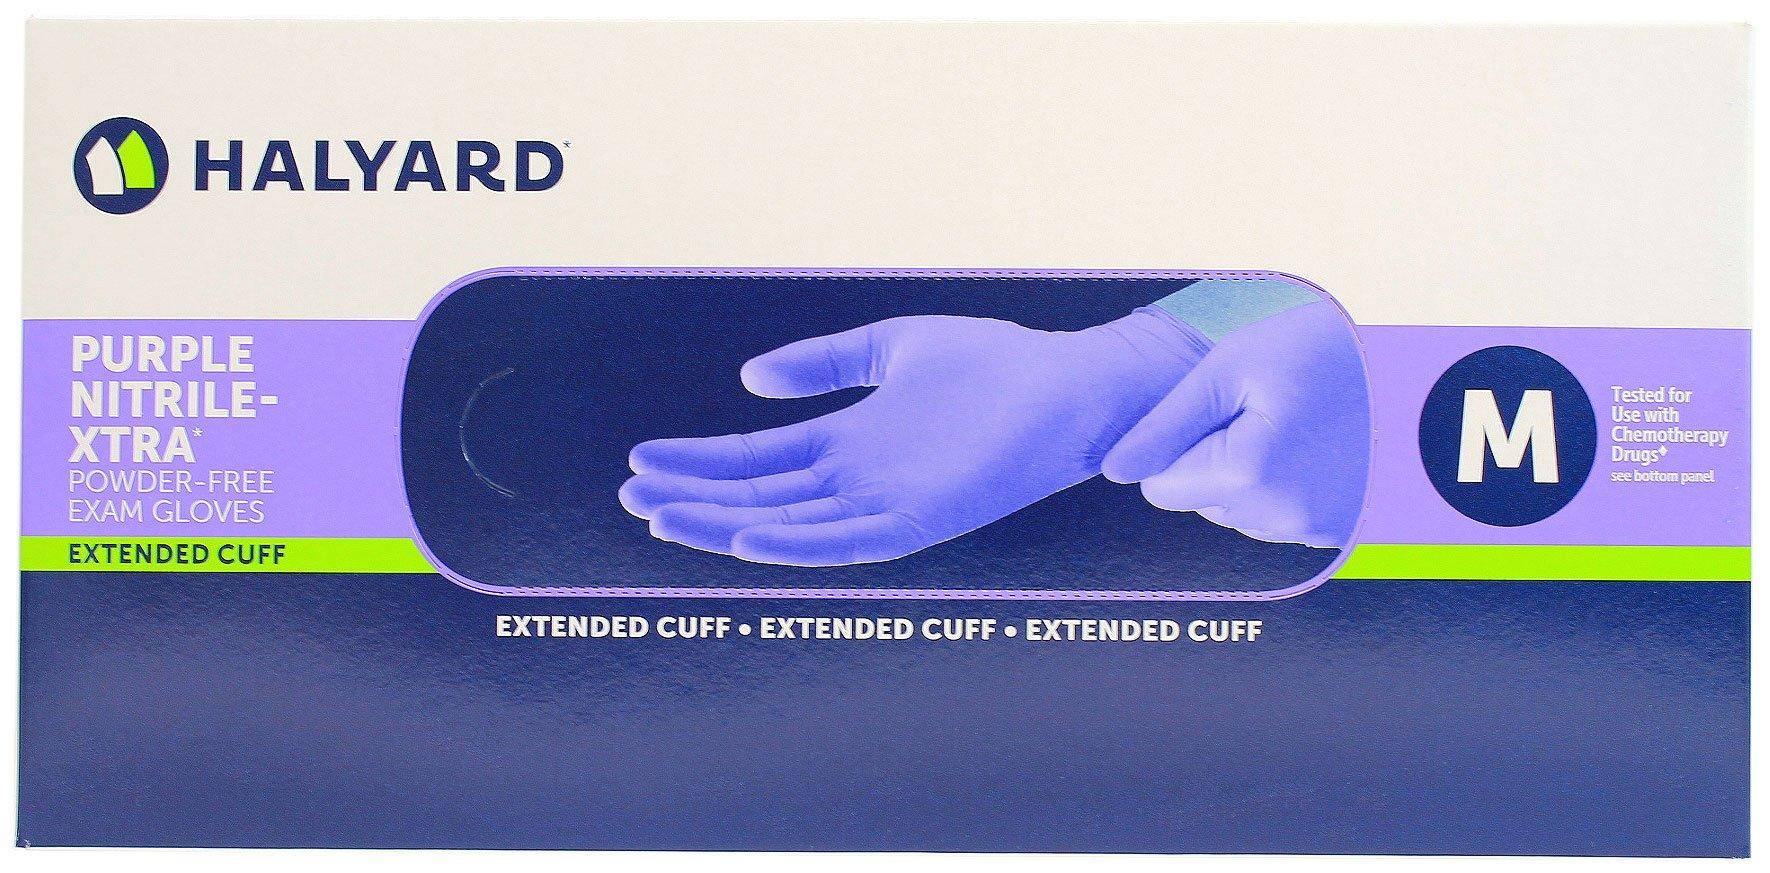 Haylard Health Purple Nitrile XTRA Powder Free Extended Cuff Exam Glove, Medium (50 Per Box)